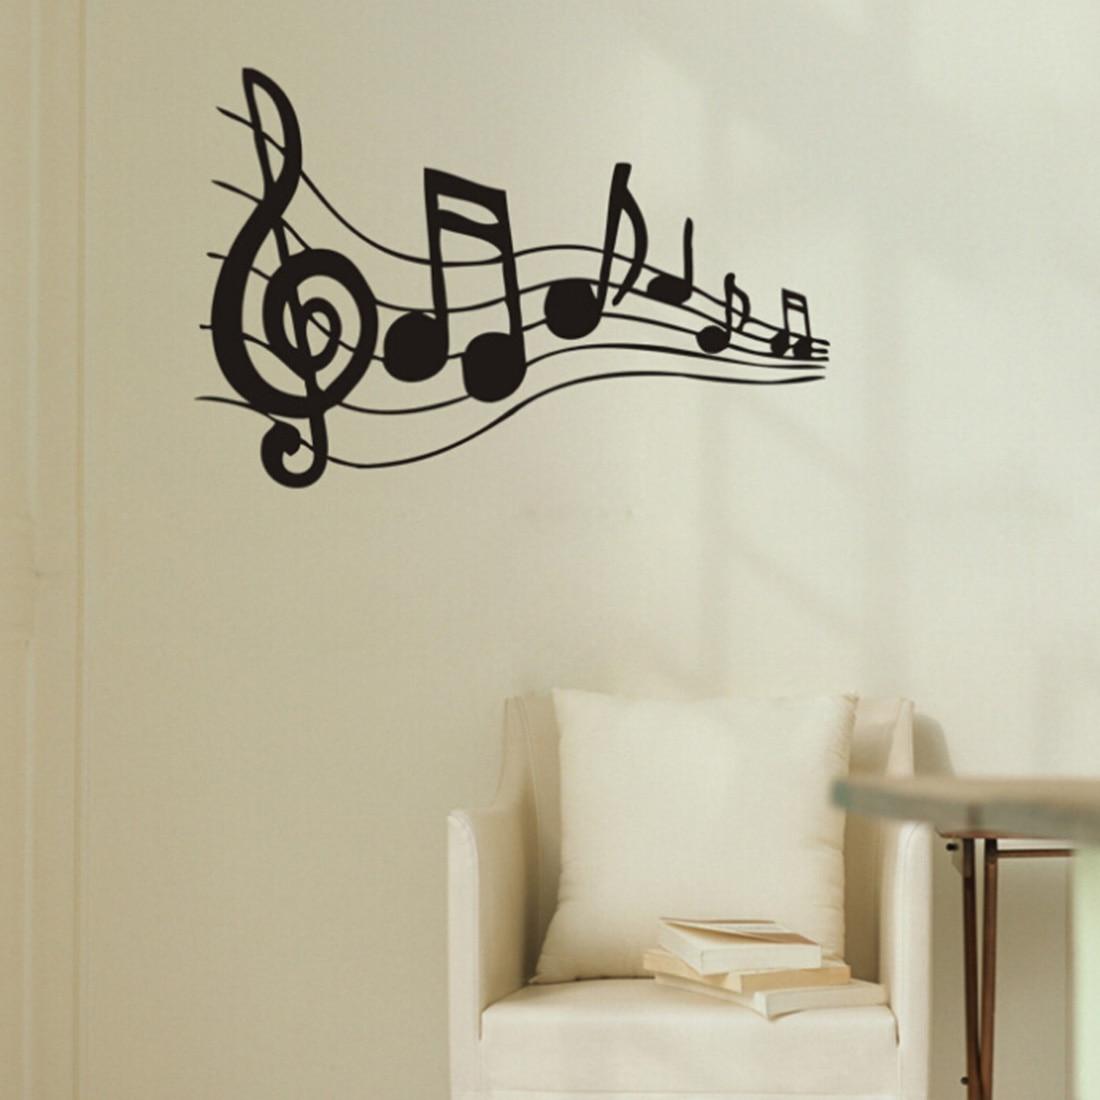 Graffiti wall vinyl -  Wall Home Decor Vinyl Decal Removable Sticker Paper Music Note Pattern Graffiti